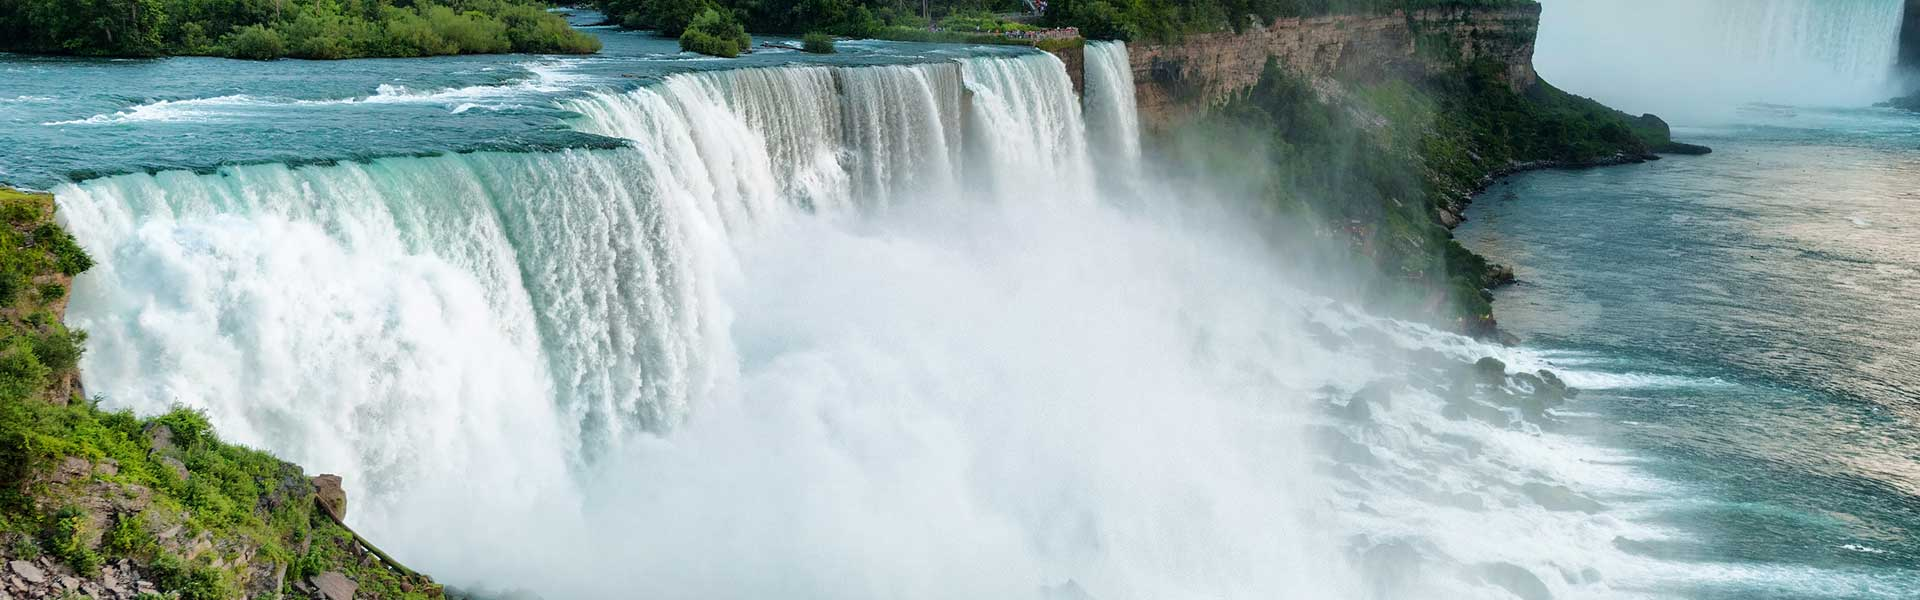 NIAGARA FALLS TOURS USA SIDE